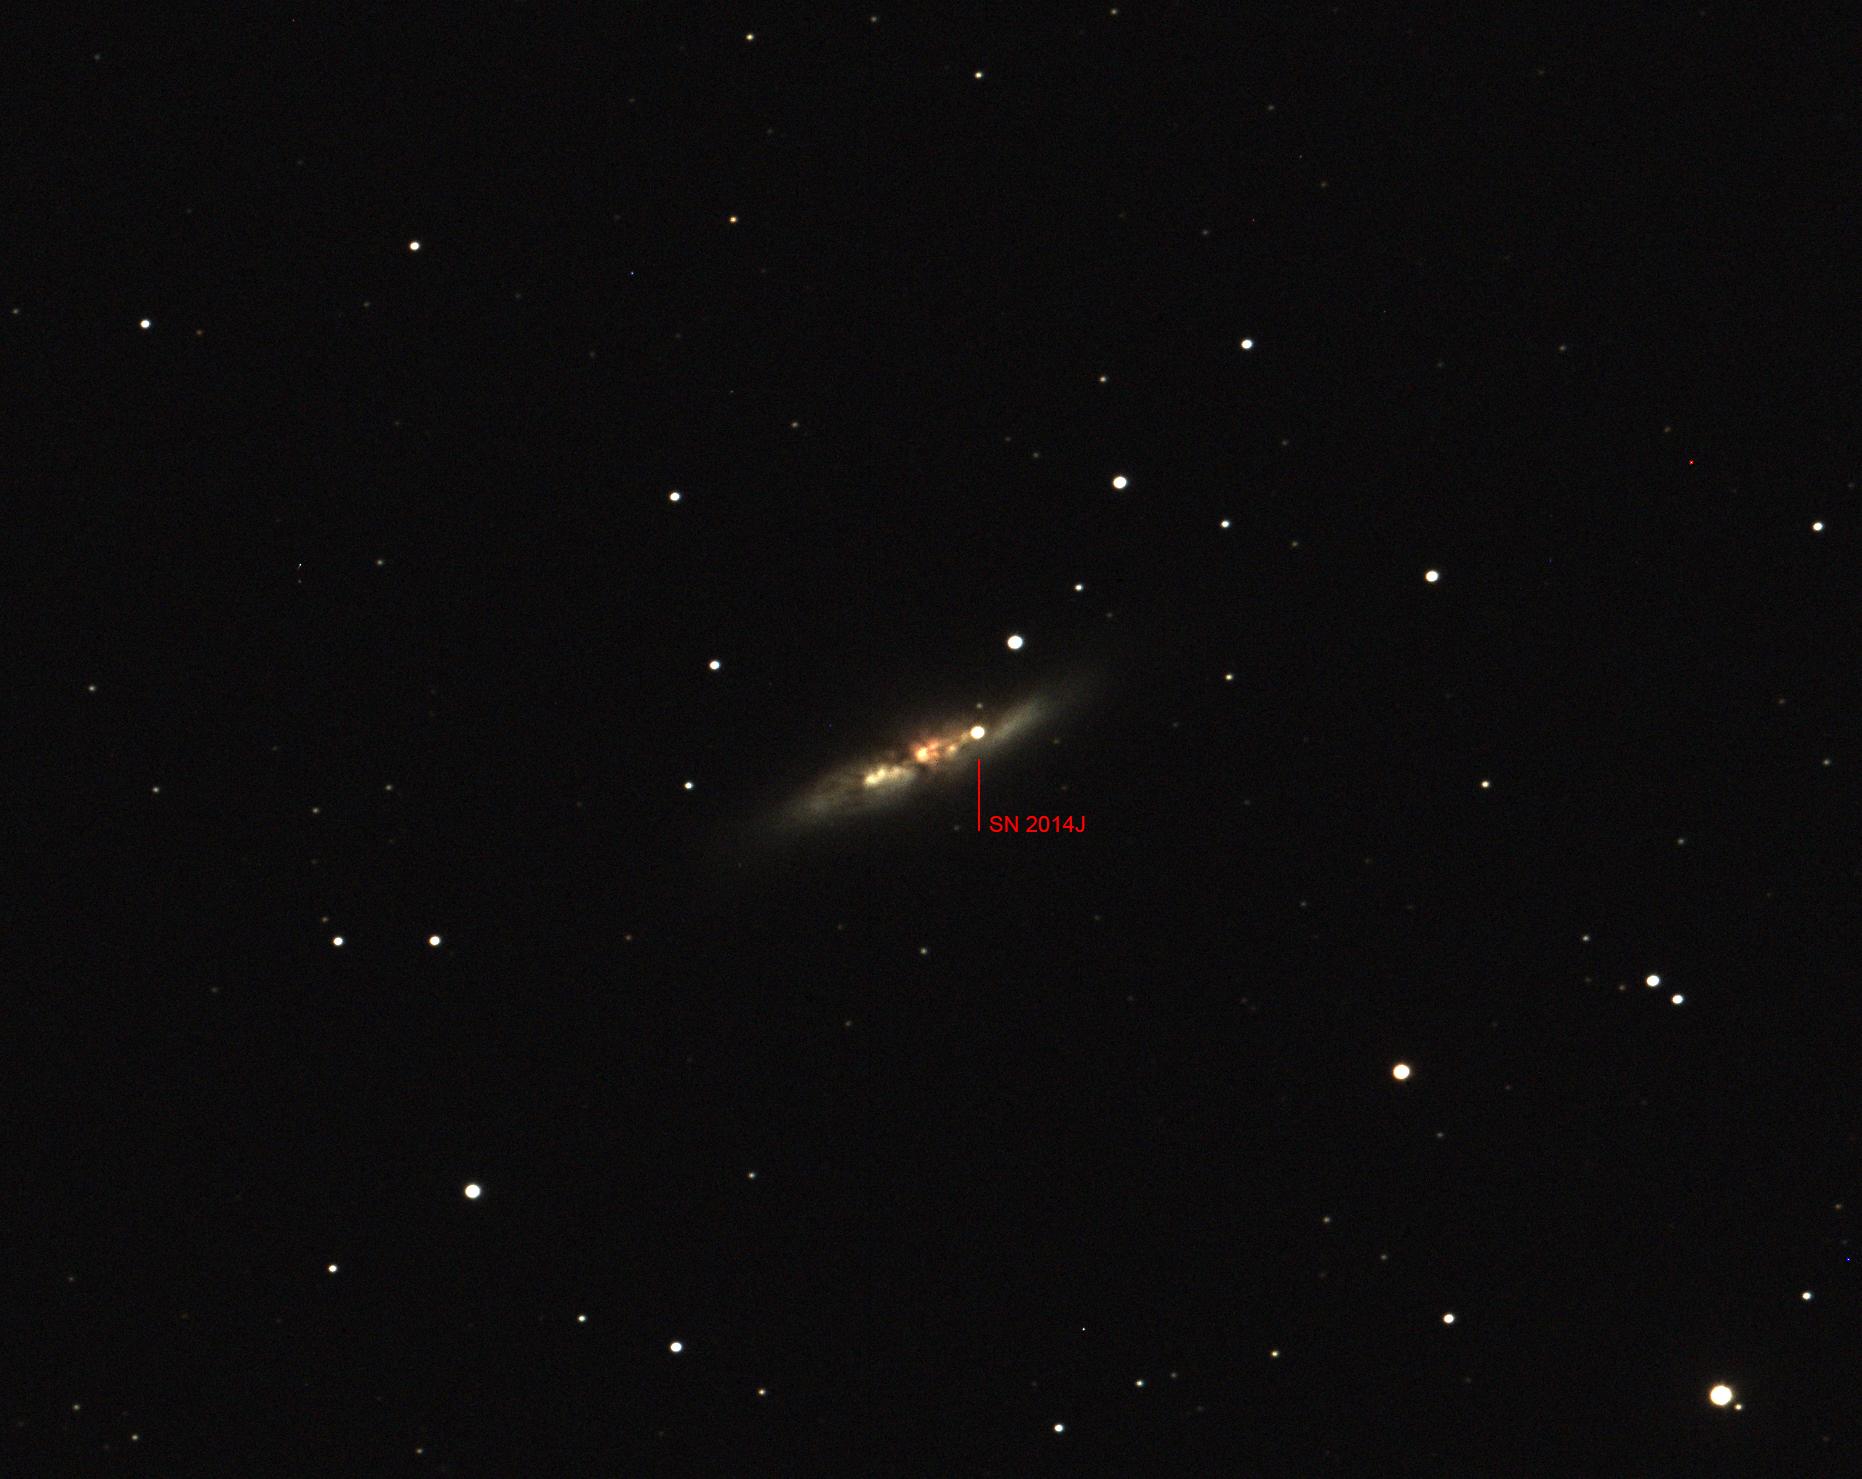 m82 supernova hubble - photo #19